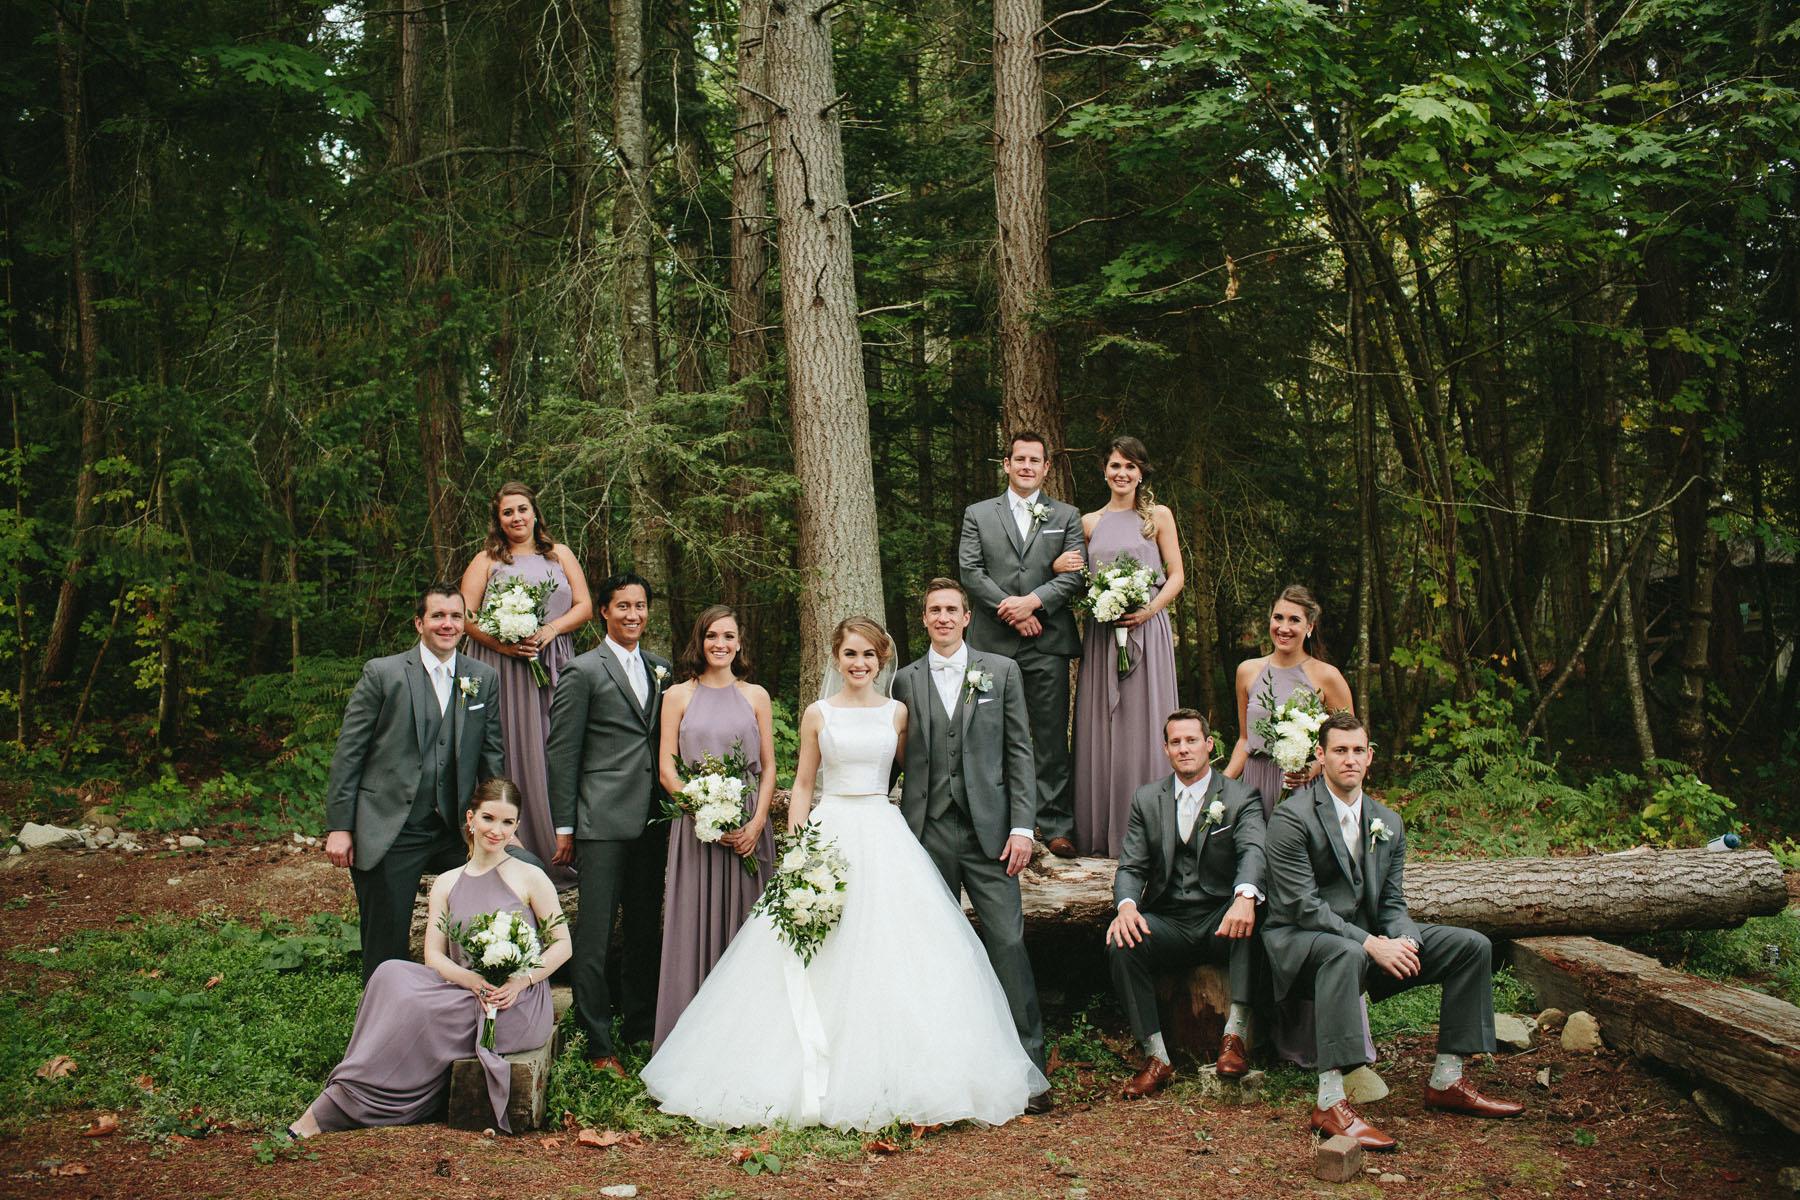 thetis-island-wedding-photographer-rp-rn-105.jpg